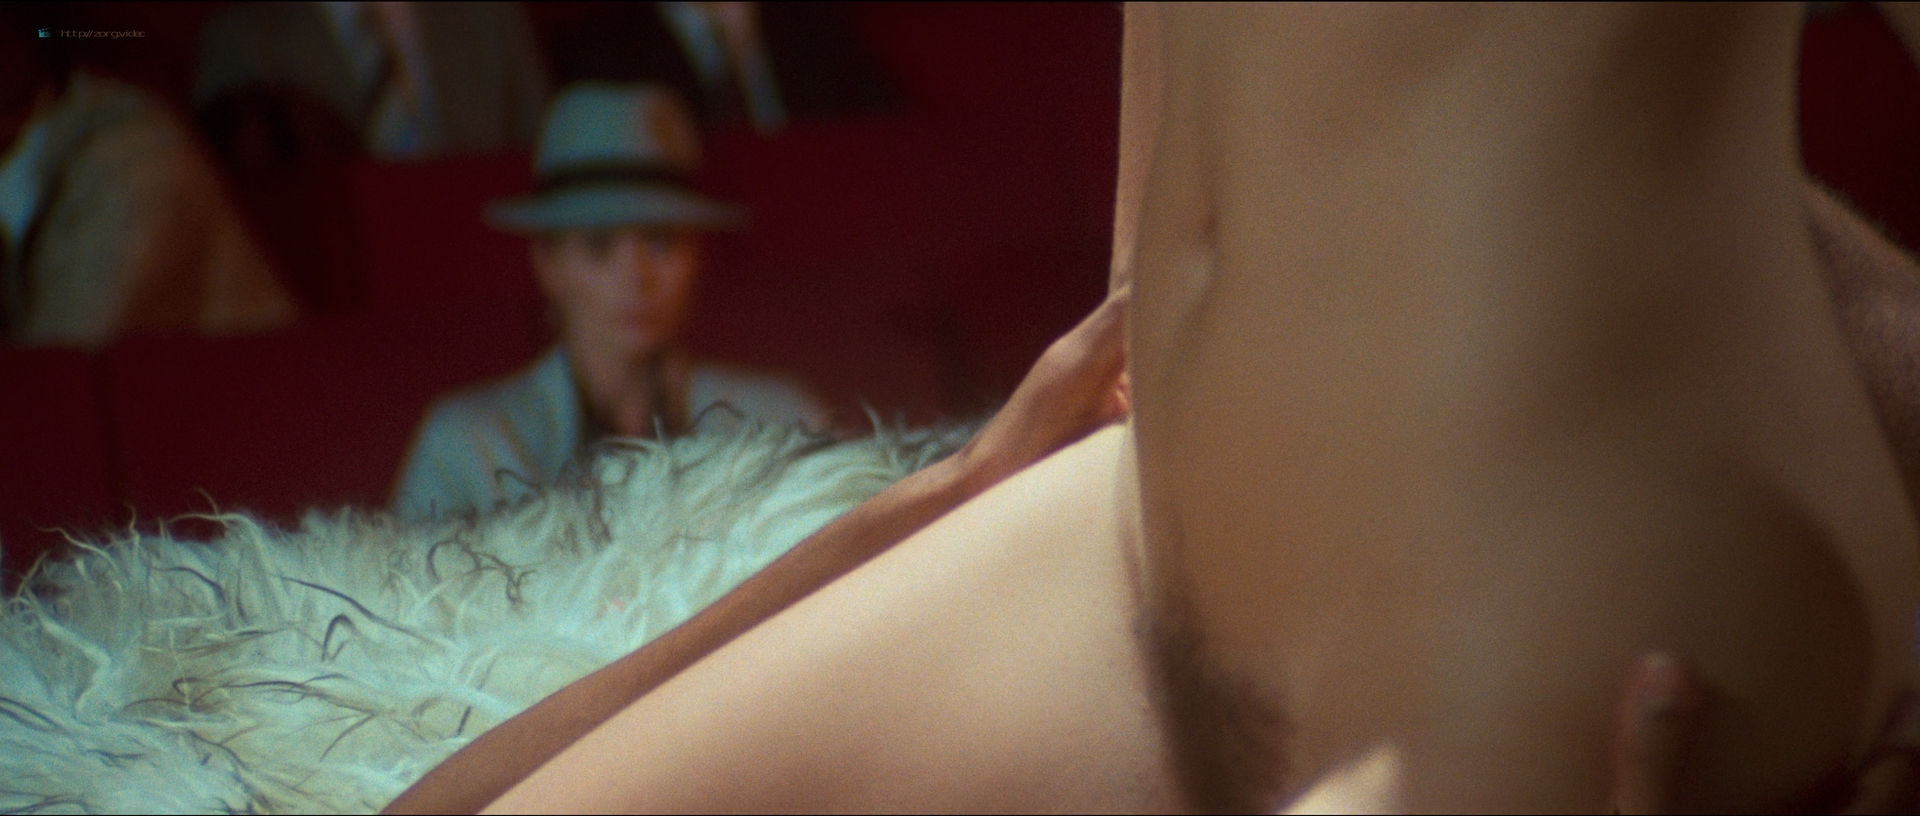 Daniela Doria nude full frontal Zora Kerova and other nude - The New York Ripper (IT-1982) HD 1080p BluRay(r) (14)